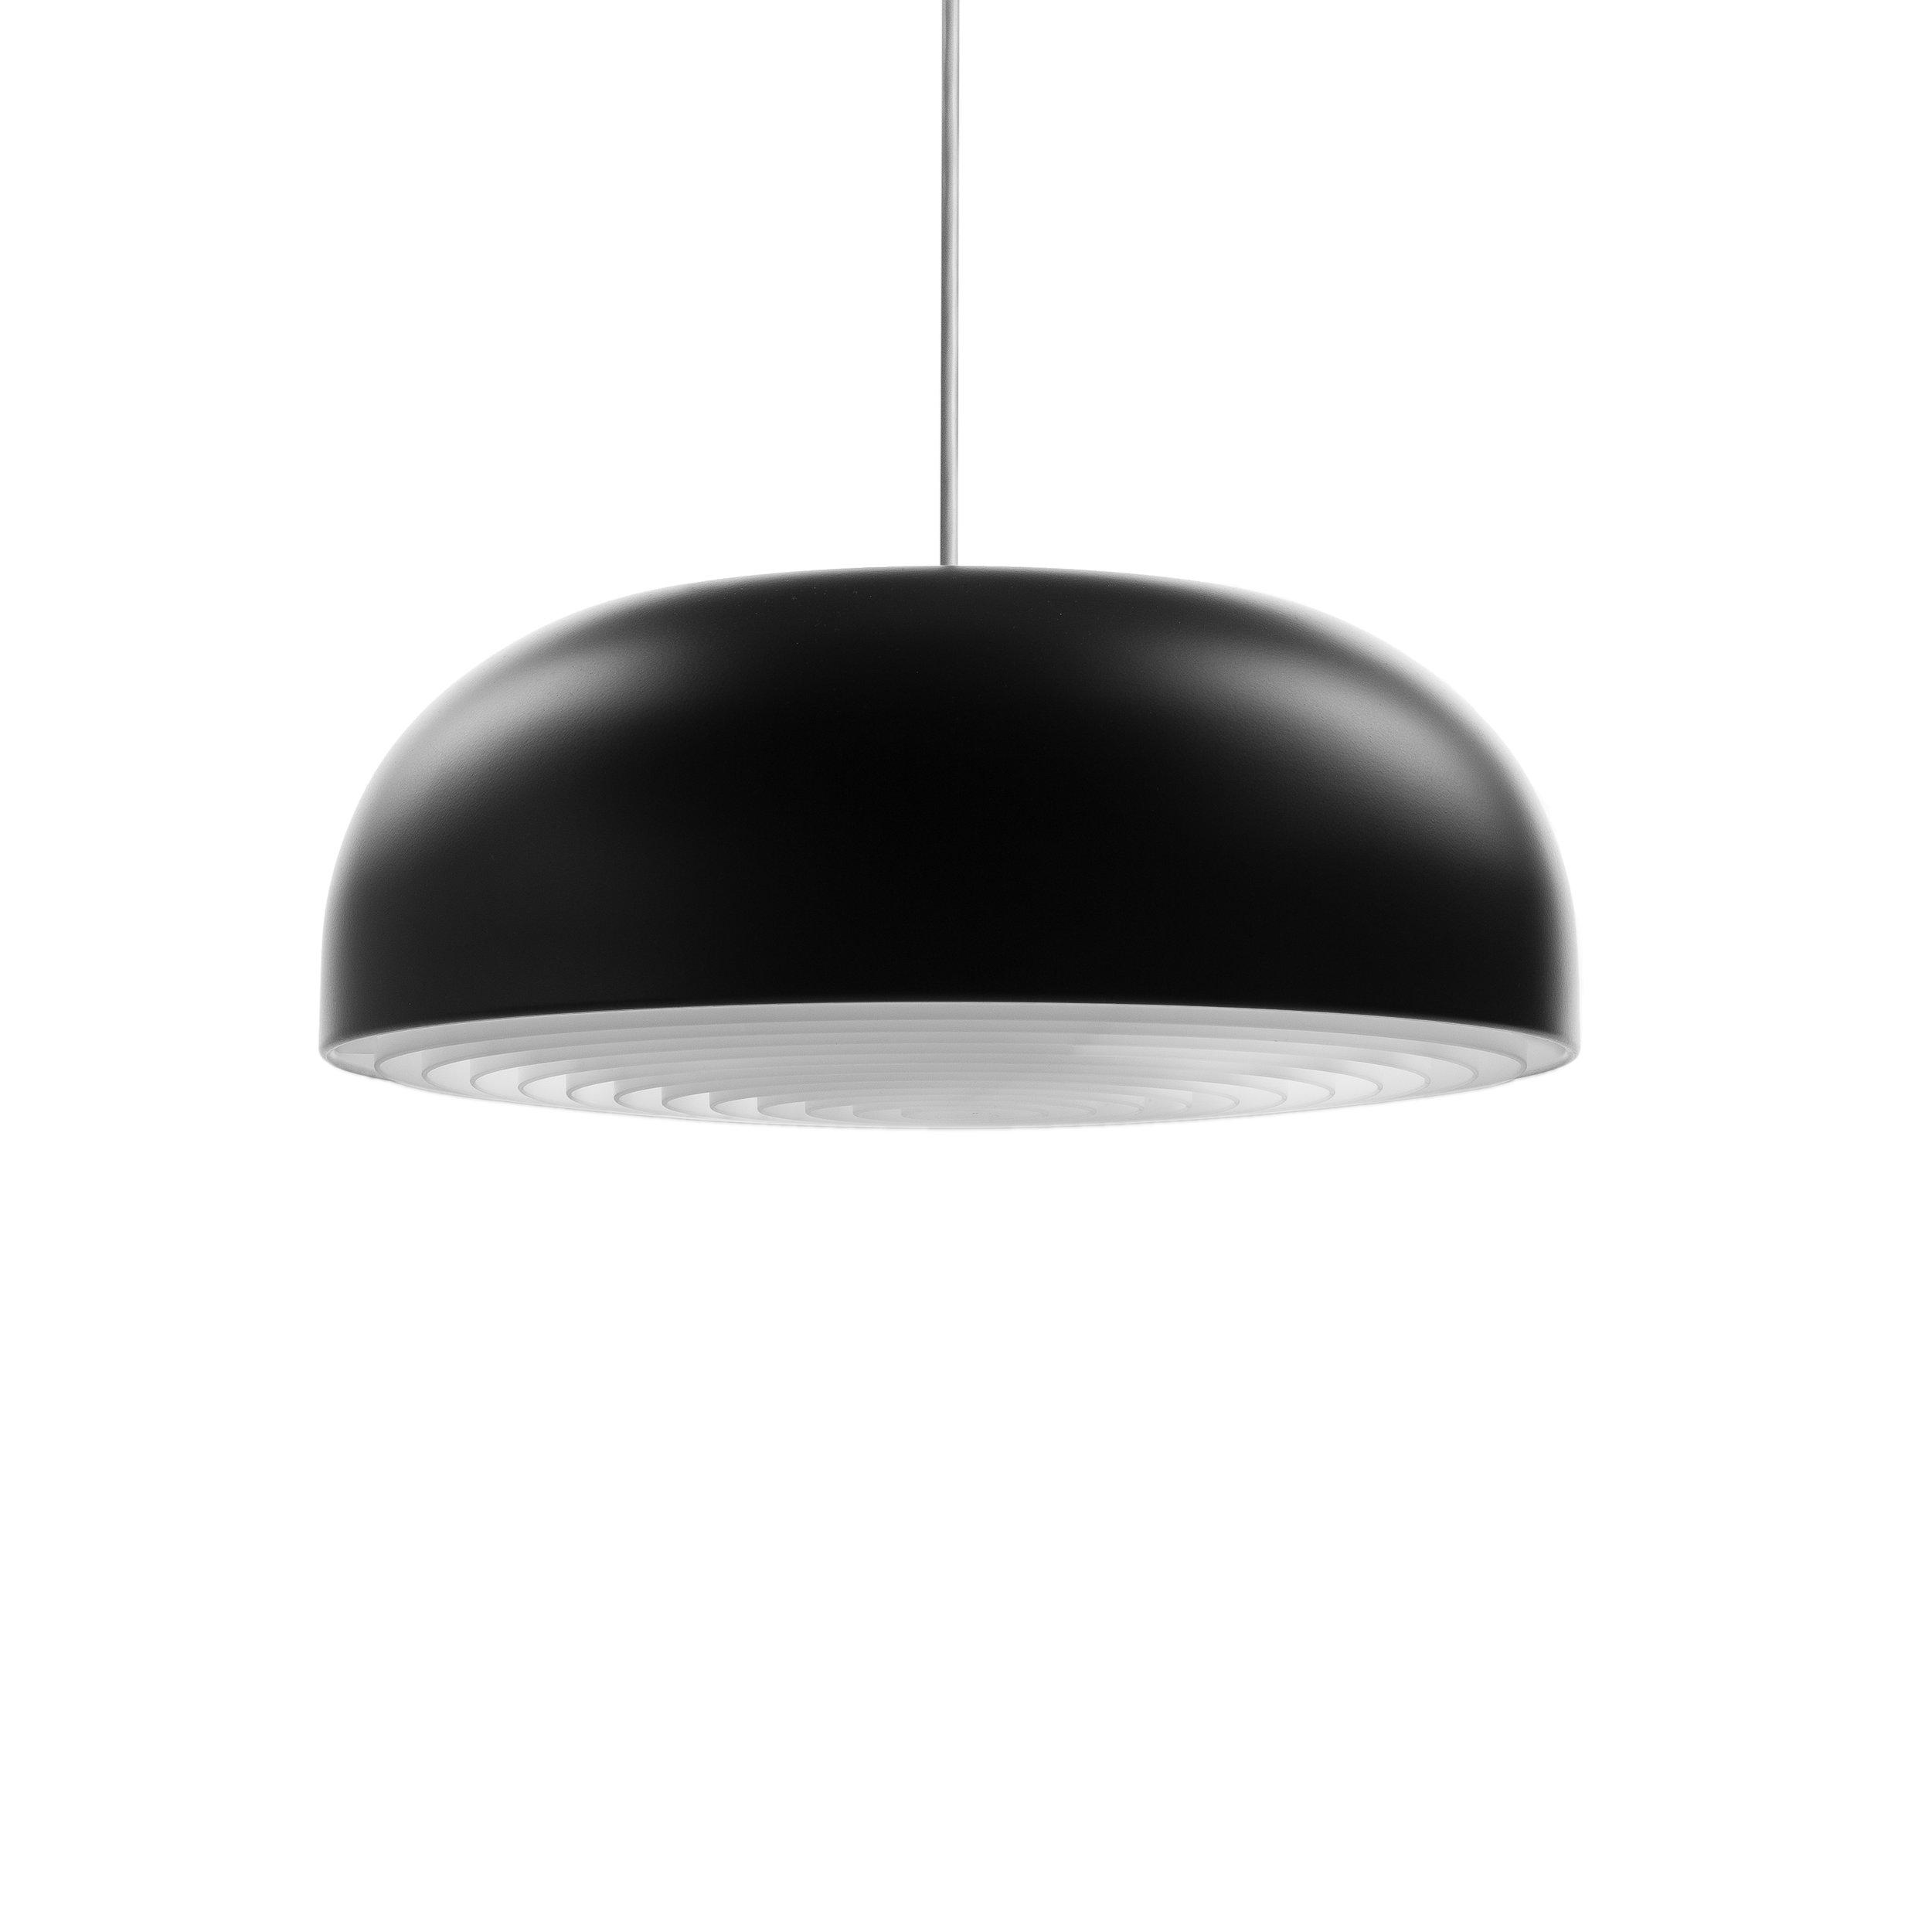 White Lamp 2-636-Edit.jpg